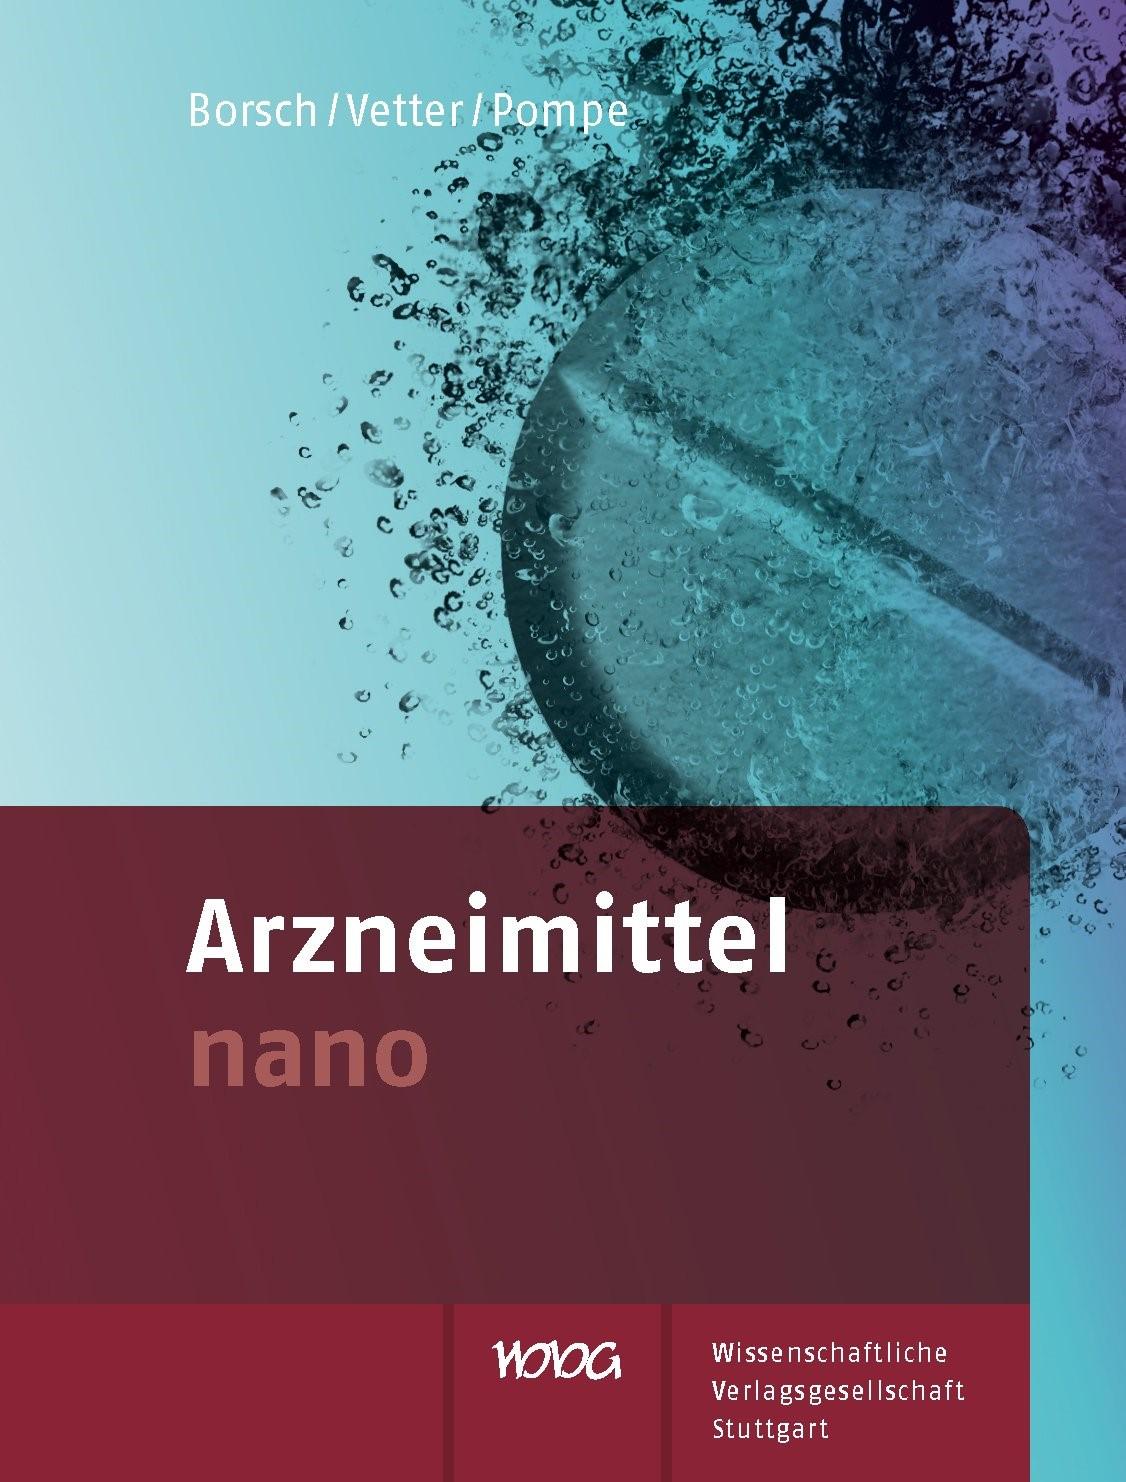 Arzneimittel nano | Borsch / Vetter / Pompe, 2015 | Buch (Cover)